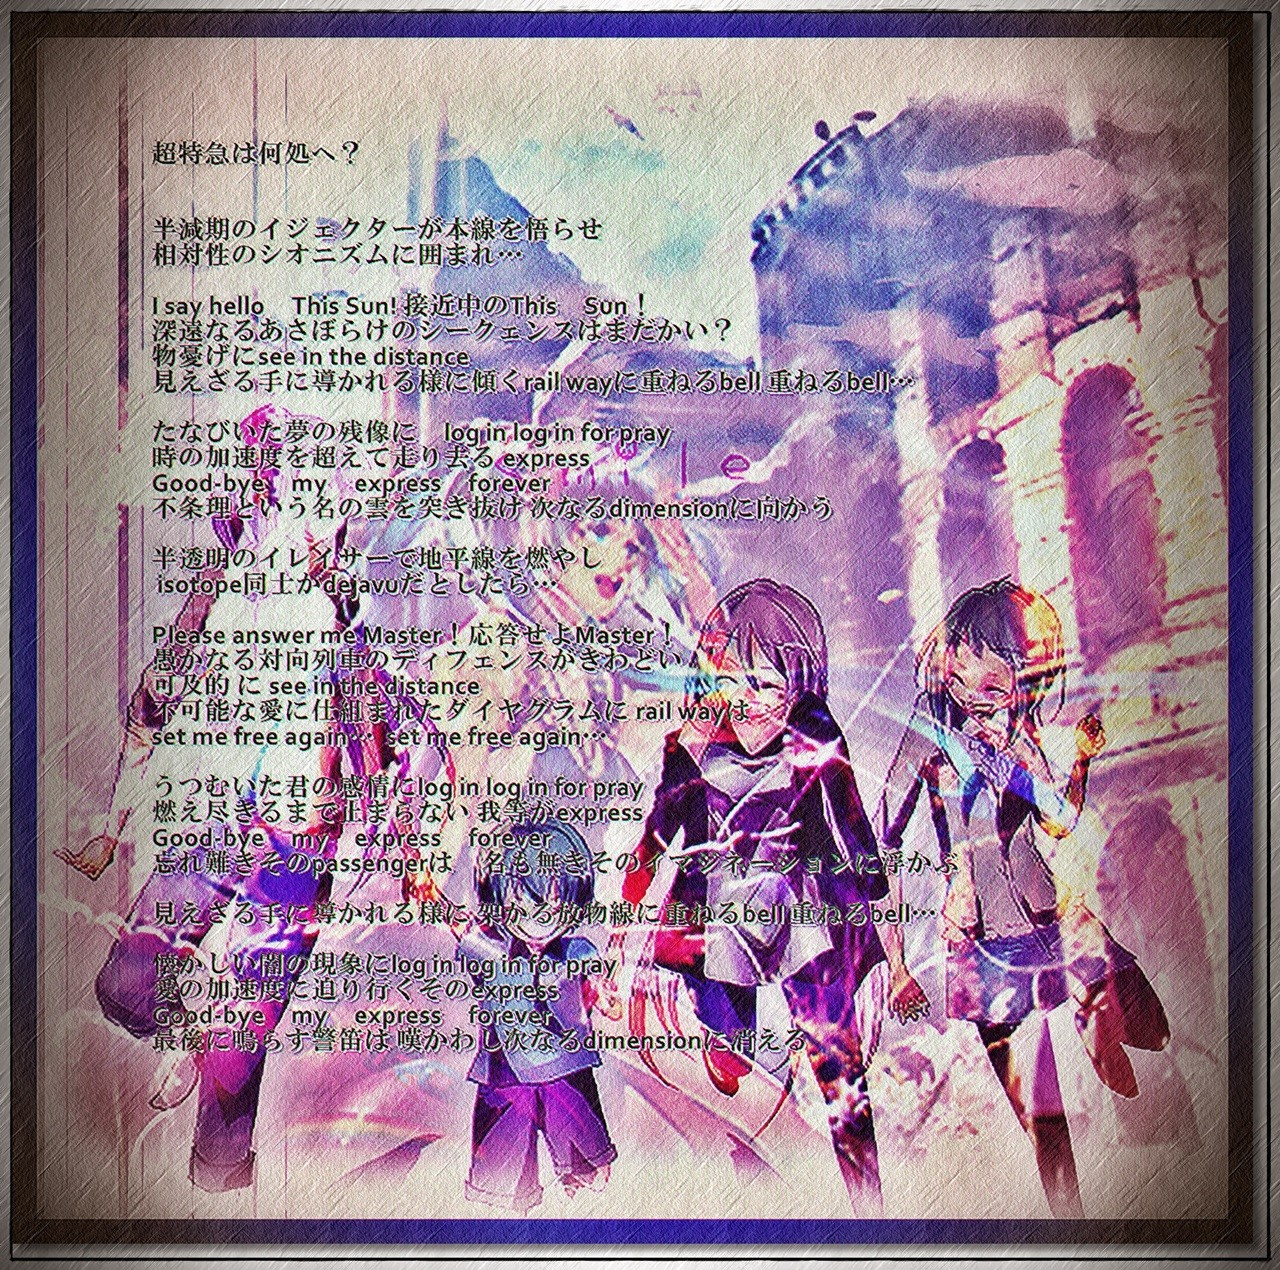 Lyricseditframe